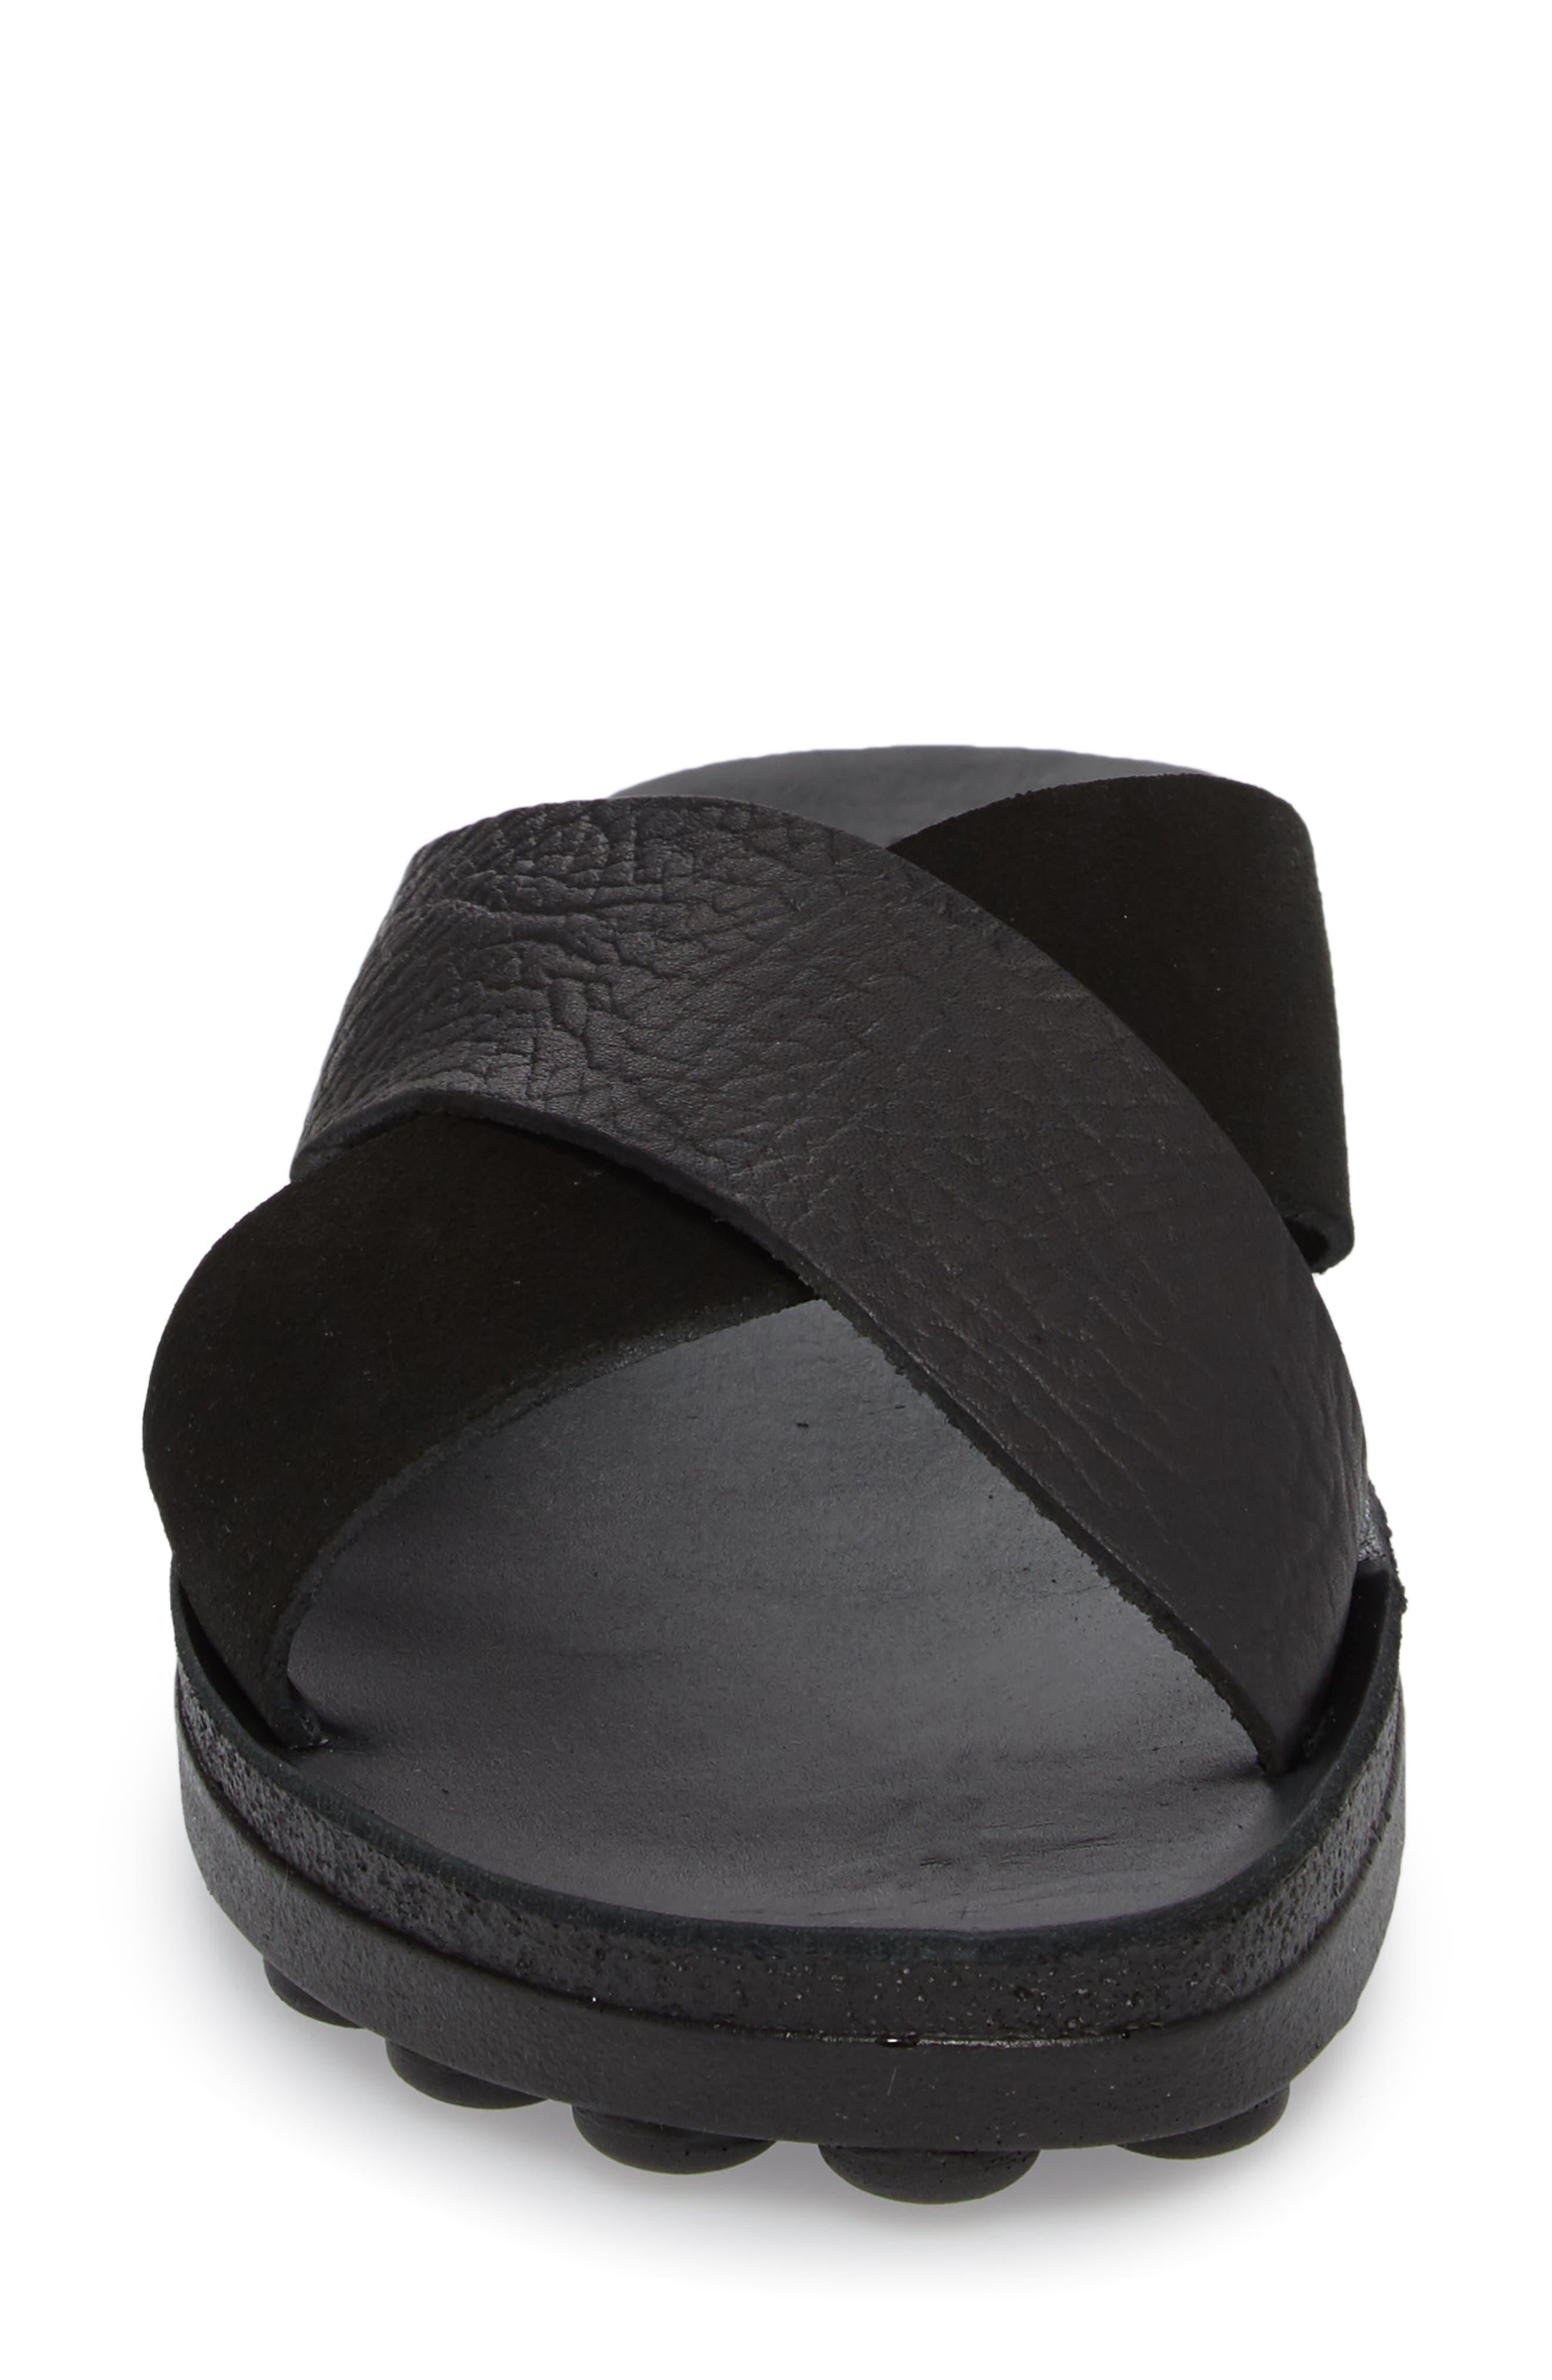 Charis Slide Sandal,                             Alternate thumbnail 4, color,                             BLACK DOLARO LEATHER